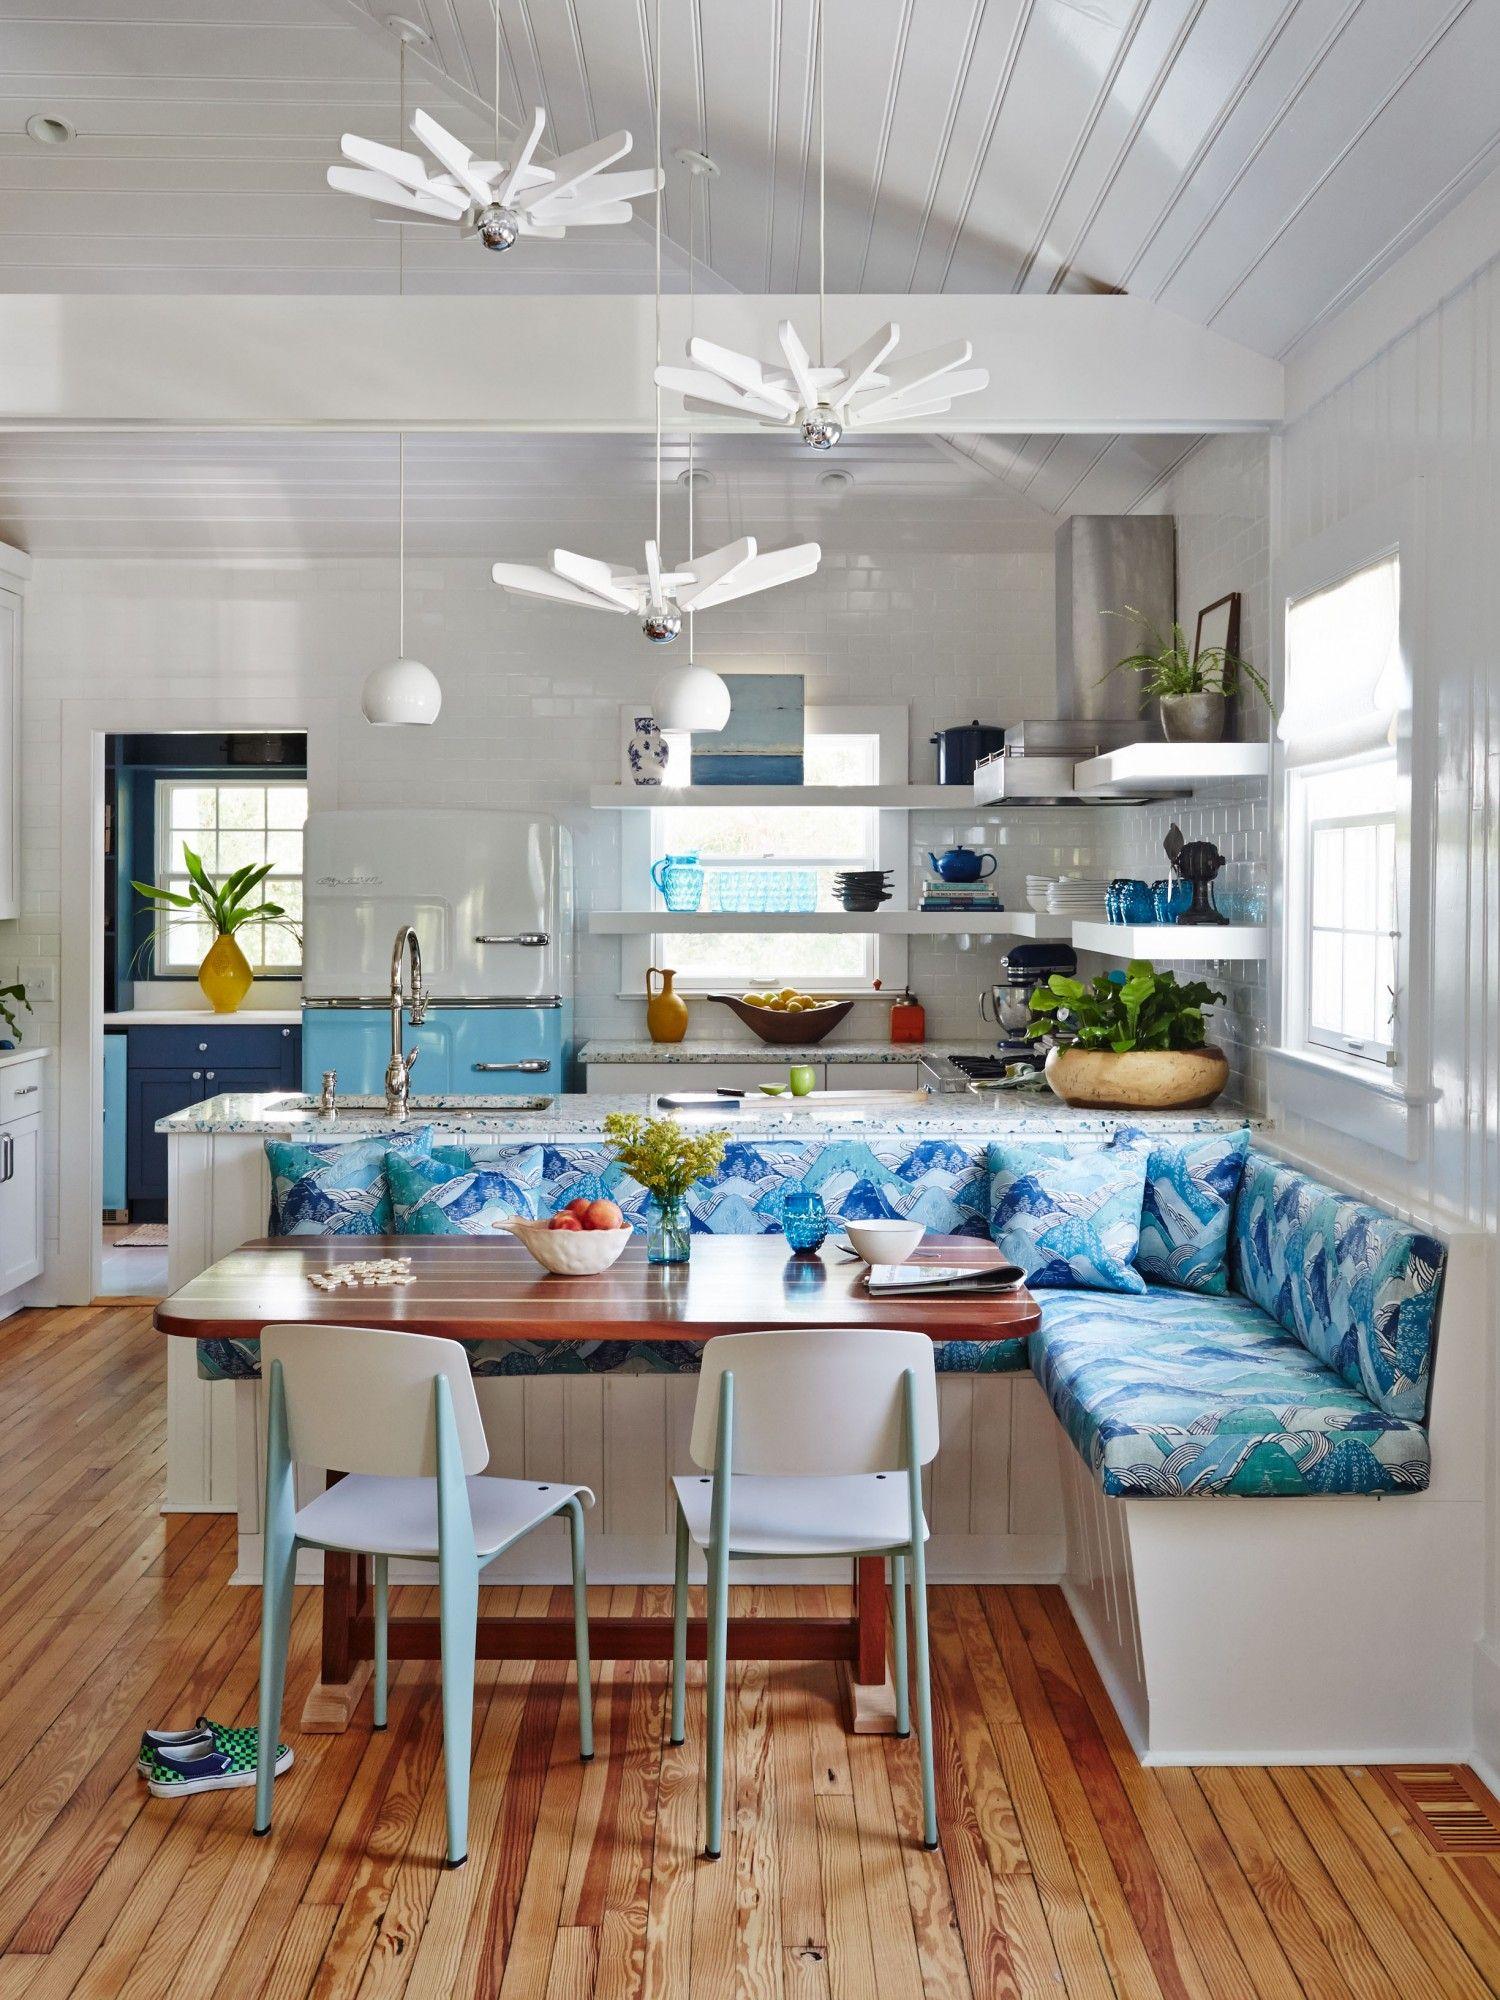 Cortney Bishop – Just another WordPress site | Kitchens | Pinterest ...